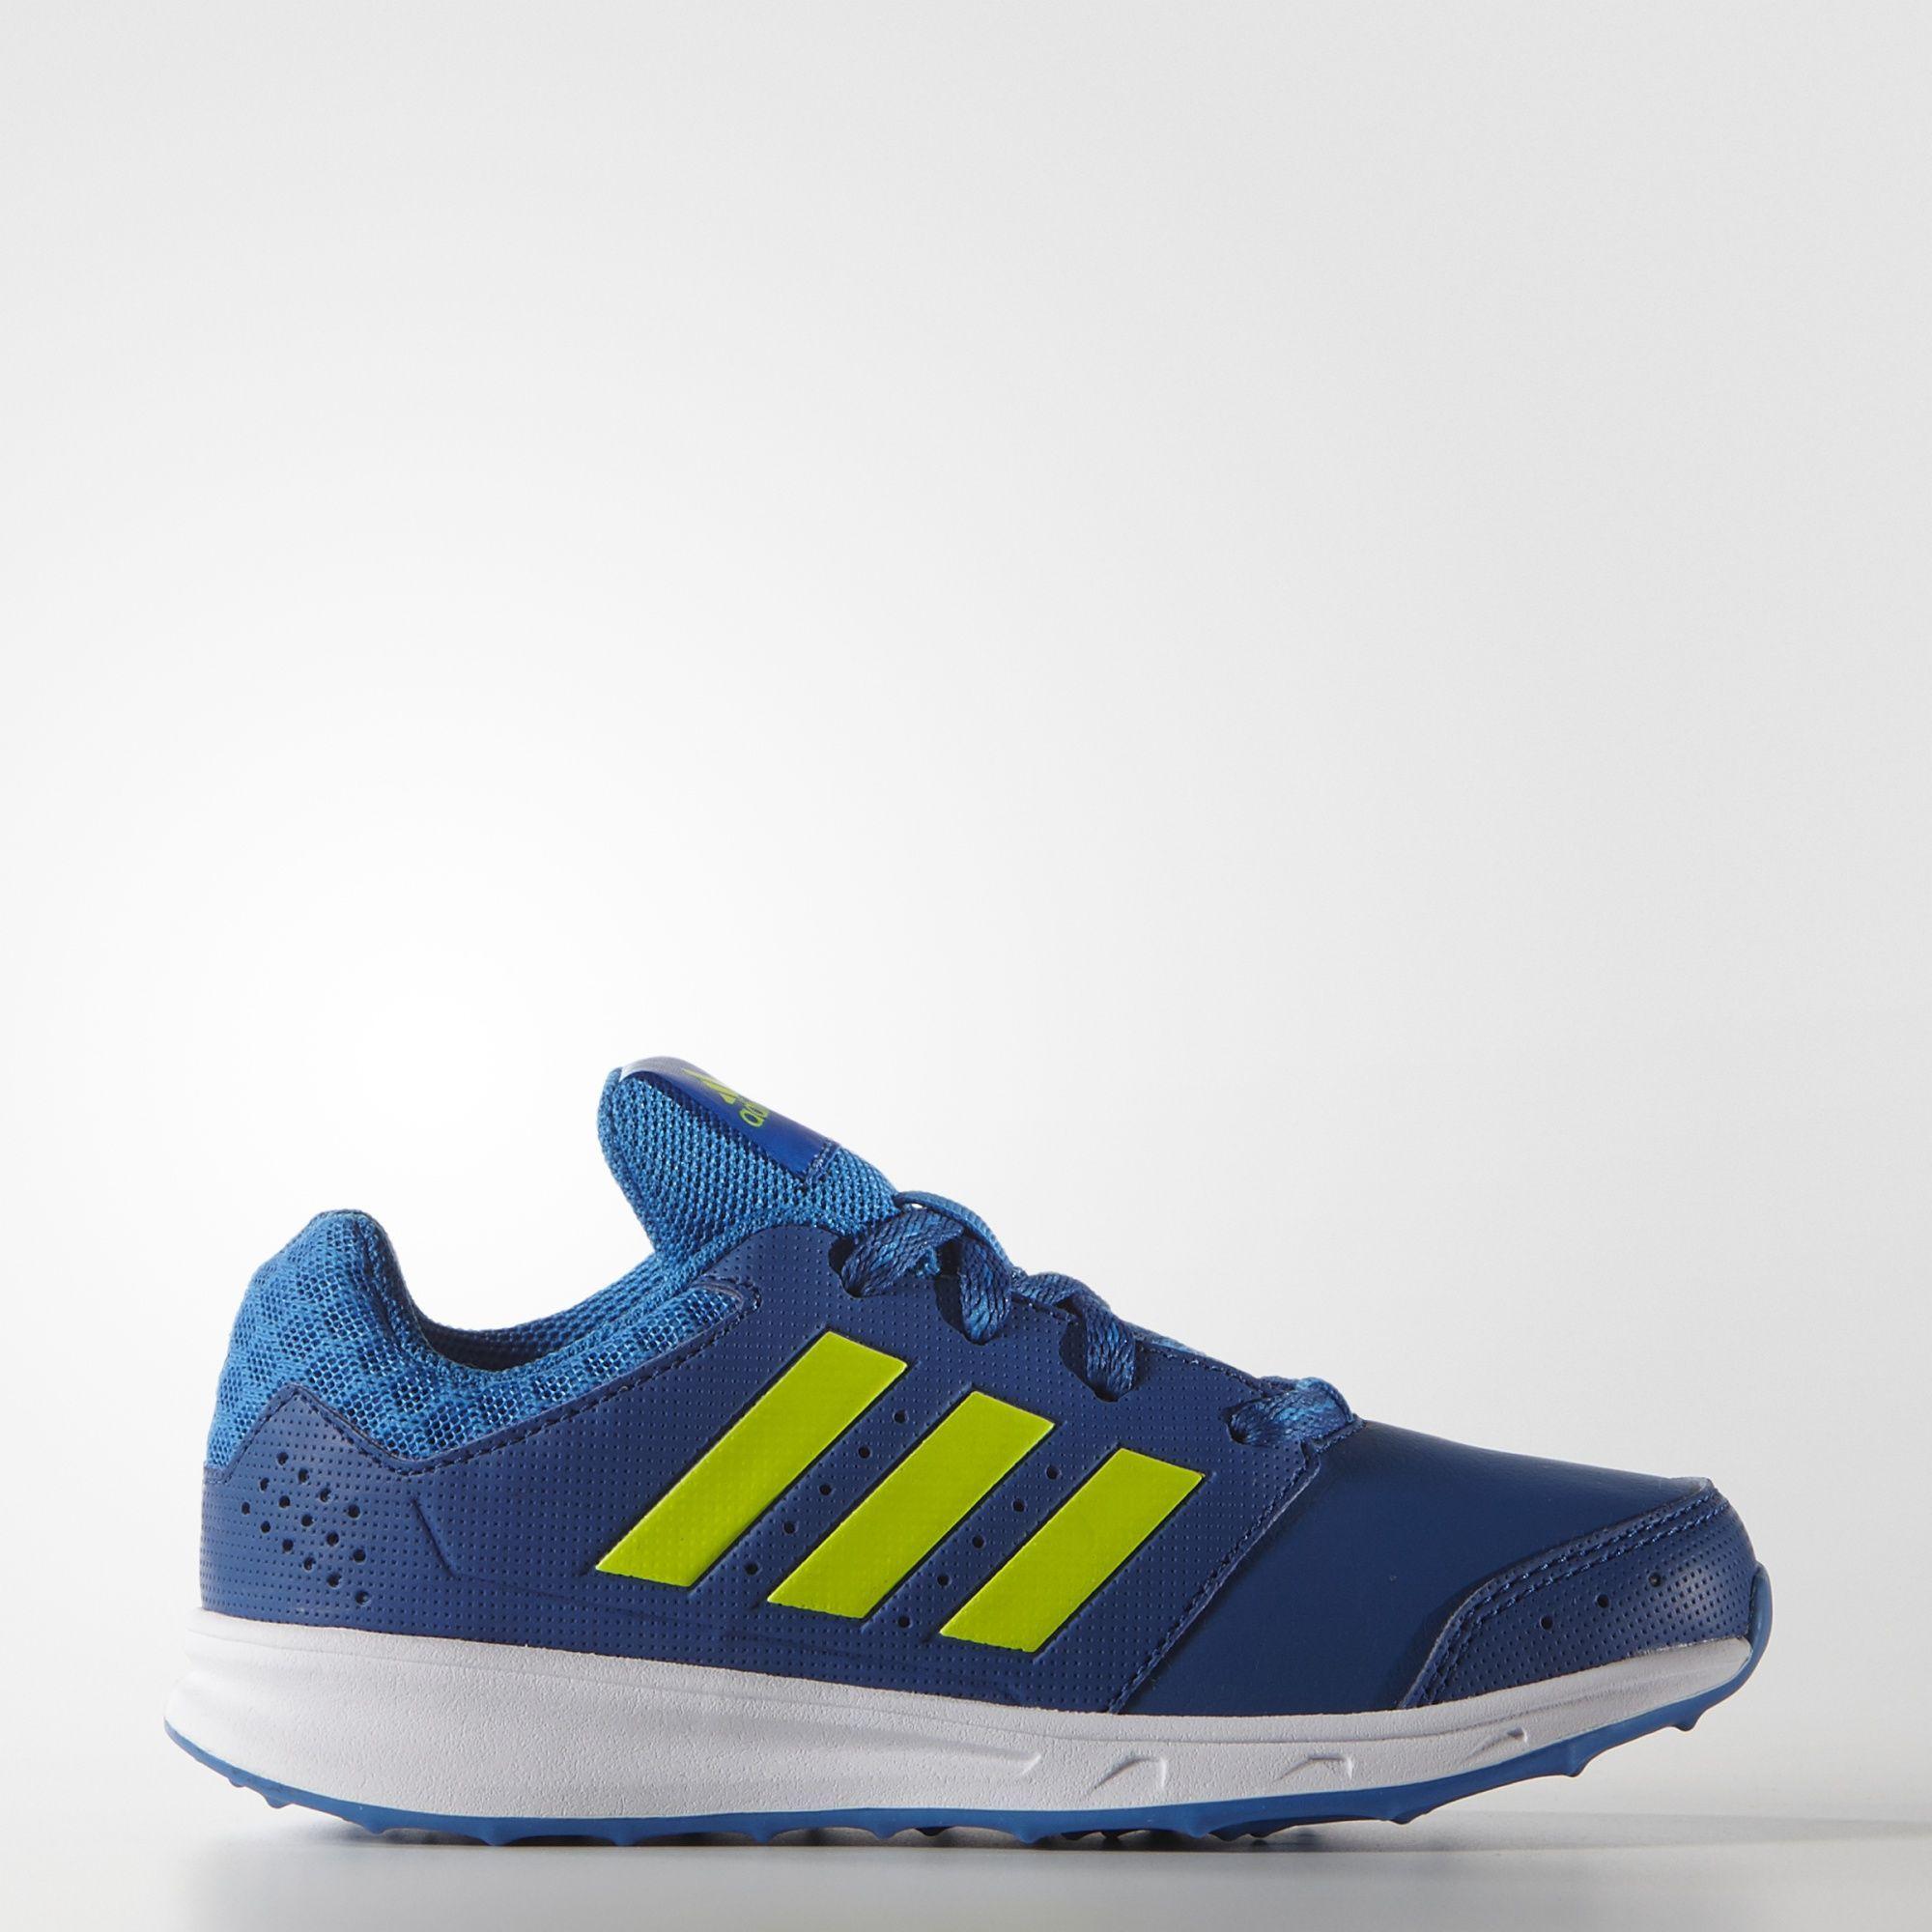 Adidas Adidas tenis deportivos Adidas Adidas y zapatillas adidas Pinterest 0db757